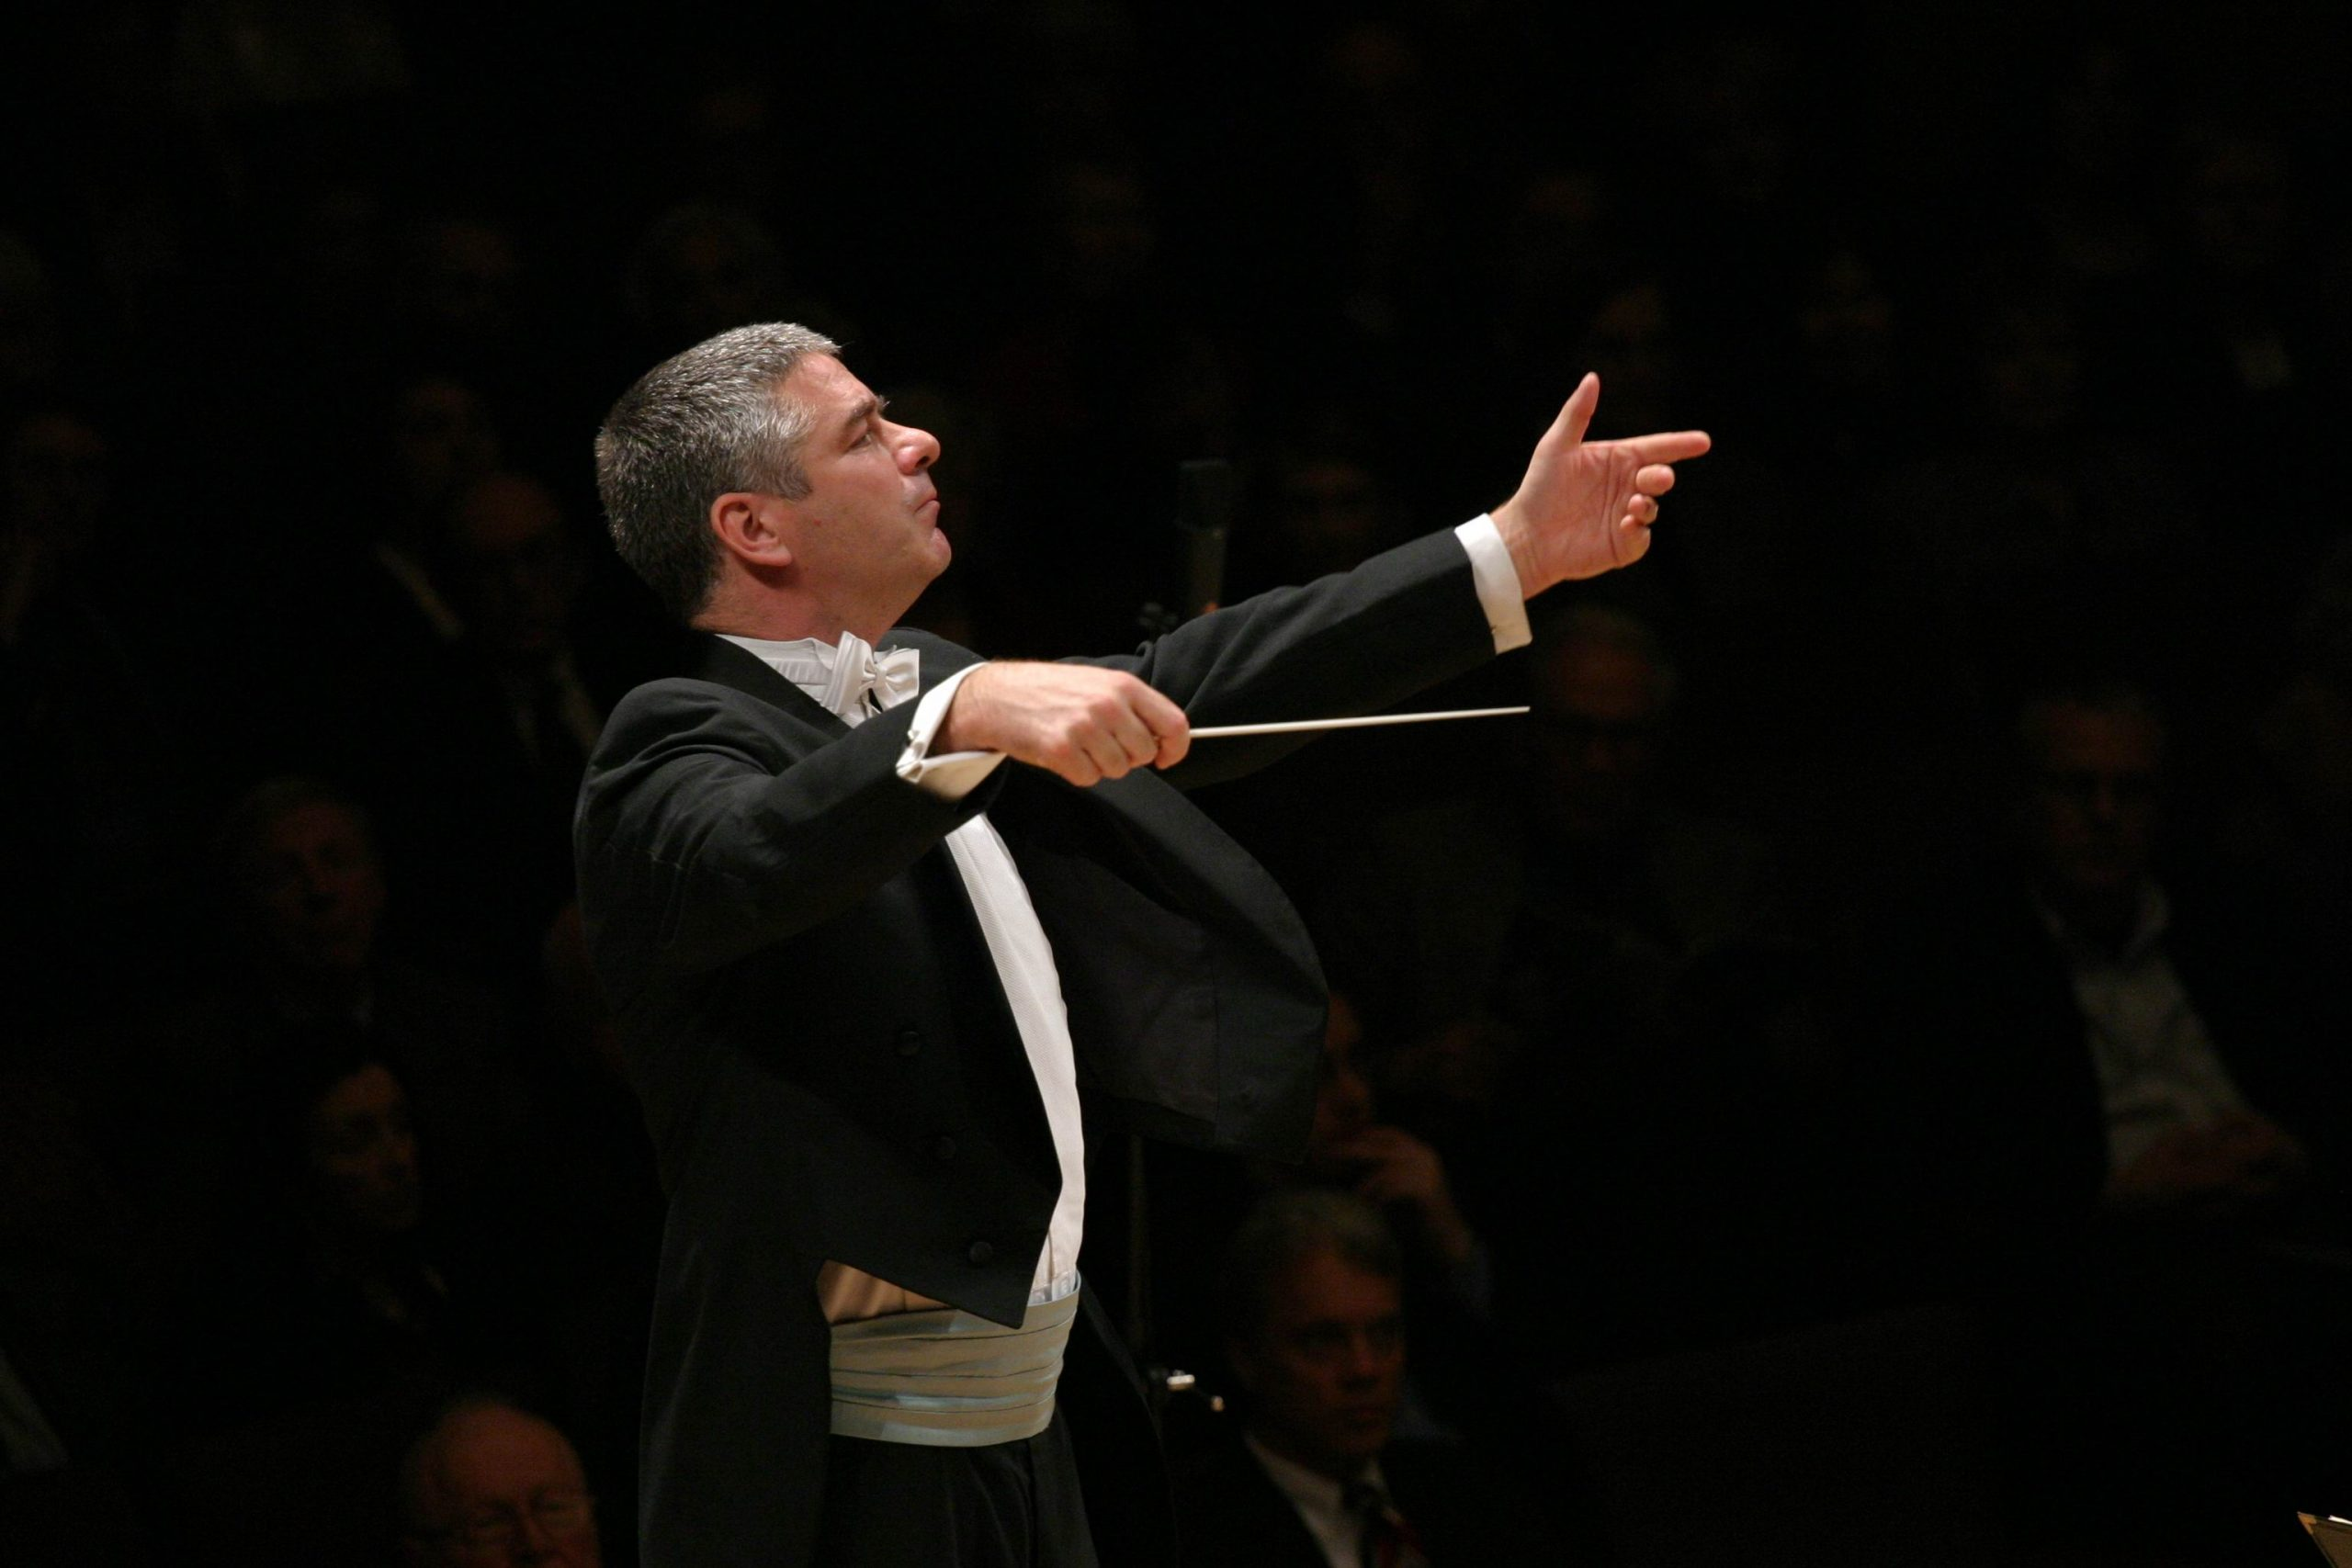 Welsh conductor Grant Llewellyn